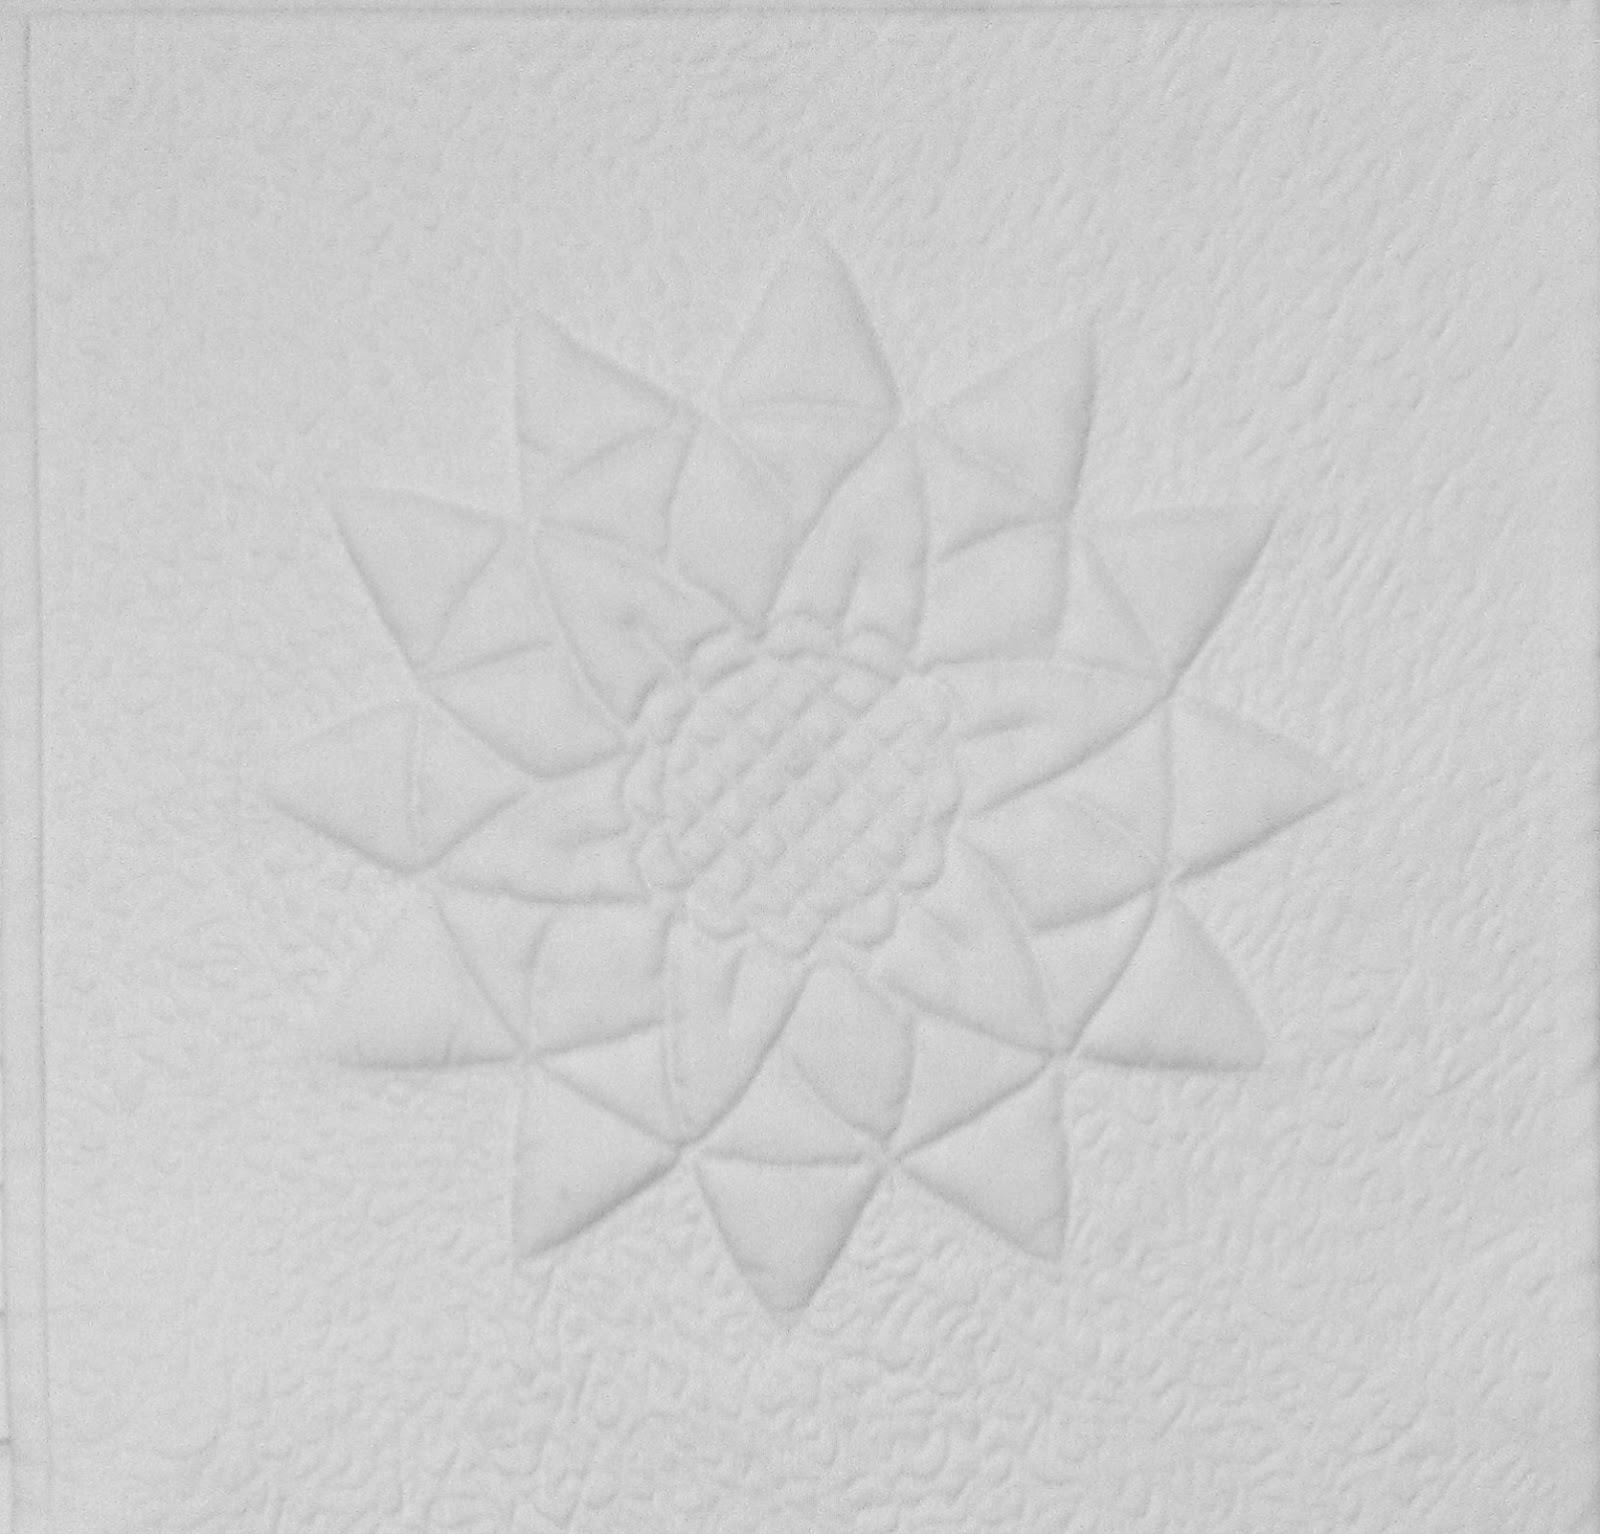 Mini-Quilt Project: #40 Trapunto Sunflower